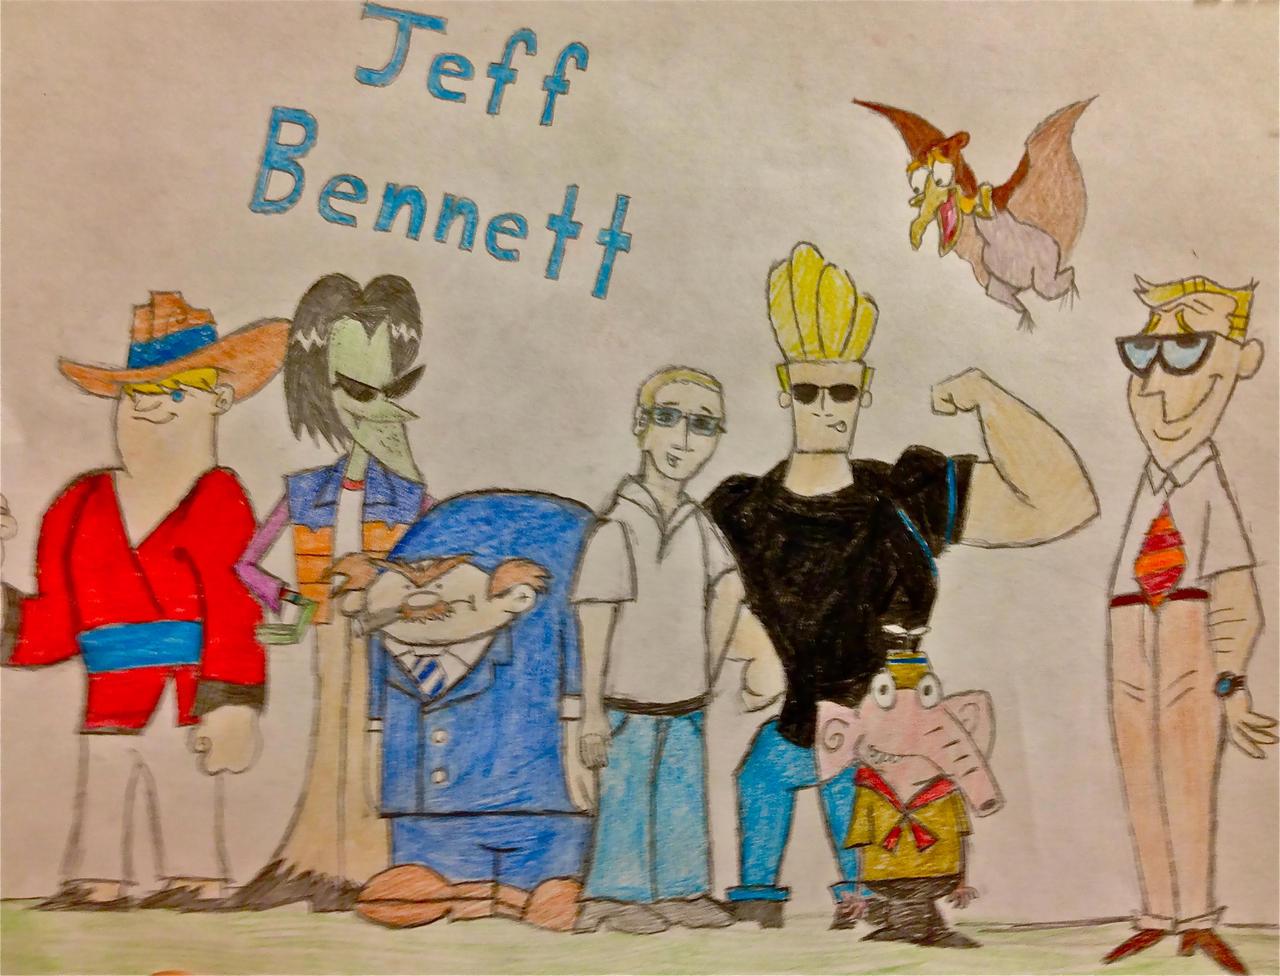 Jeff Bennett Johnny Bravo As Pictures to Pin on Pinterest ...  Jeff Bennett Jo...